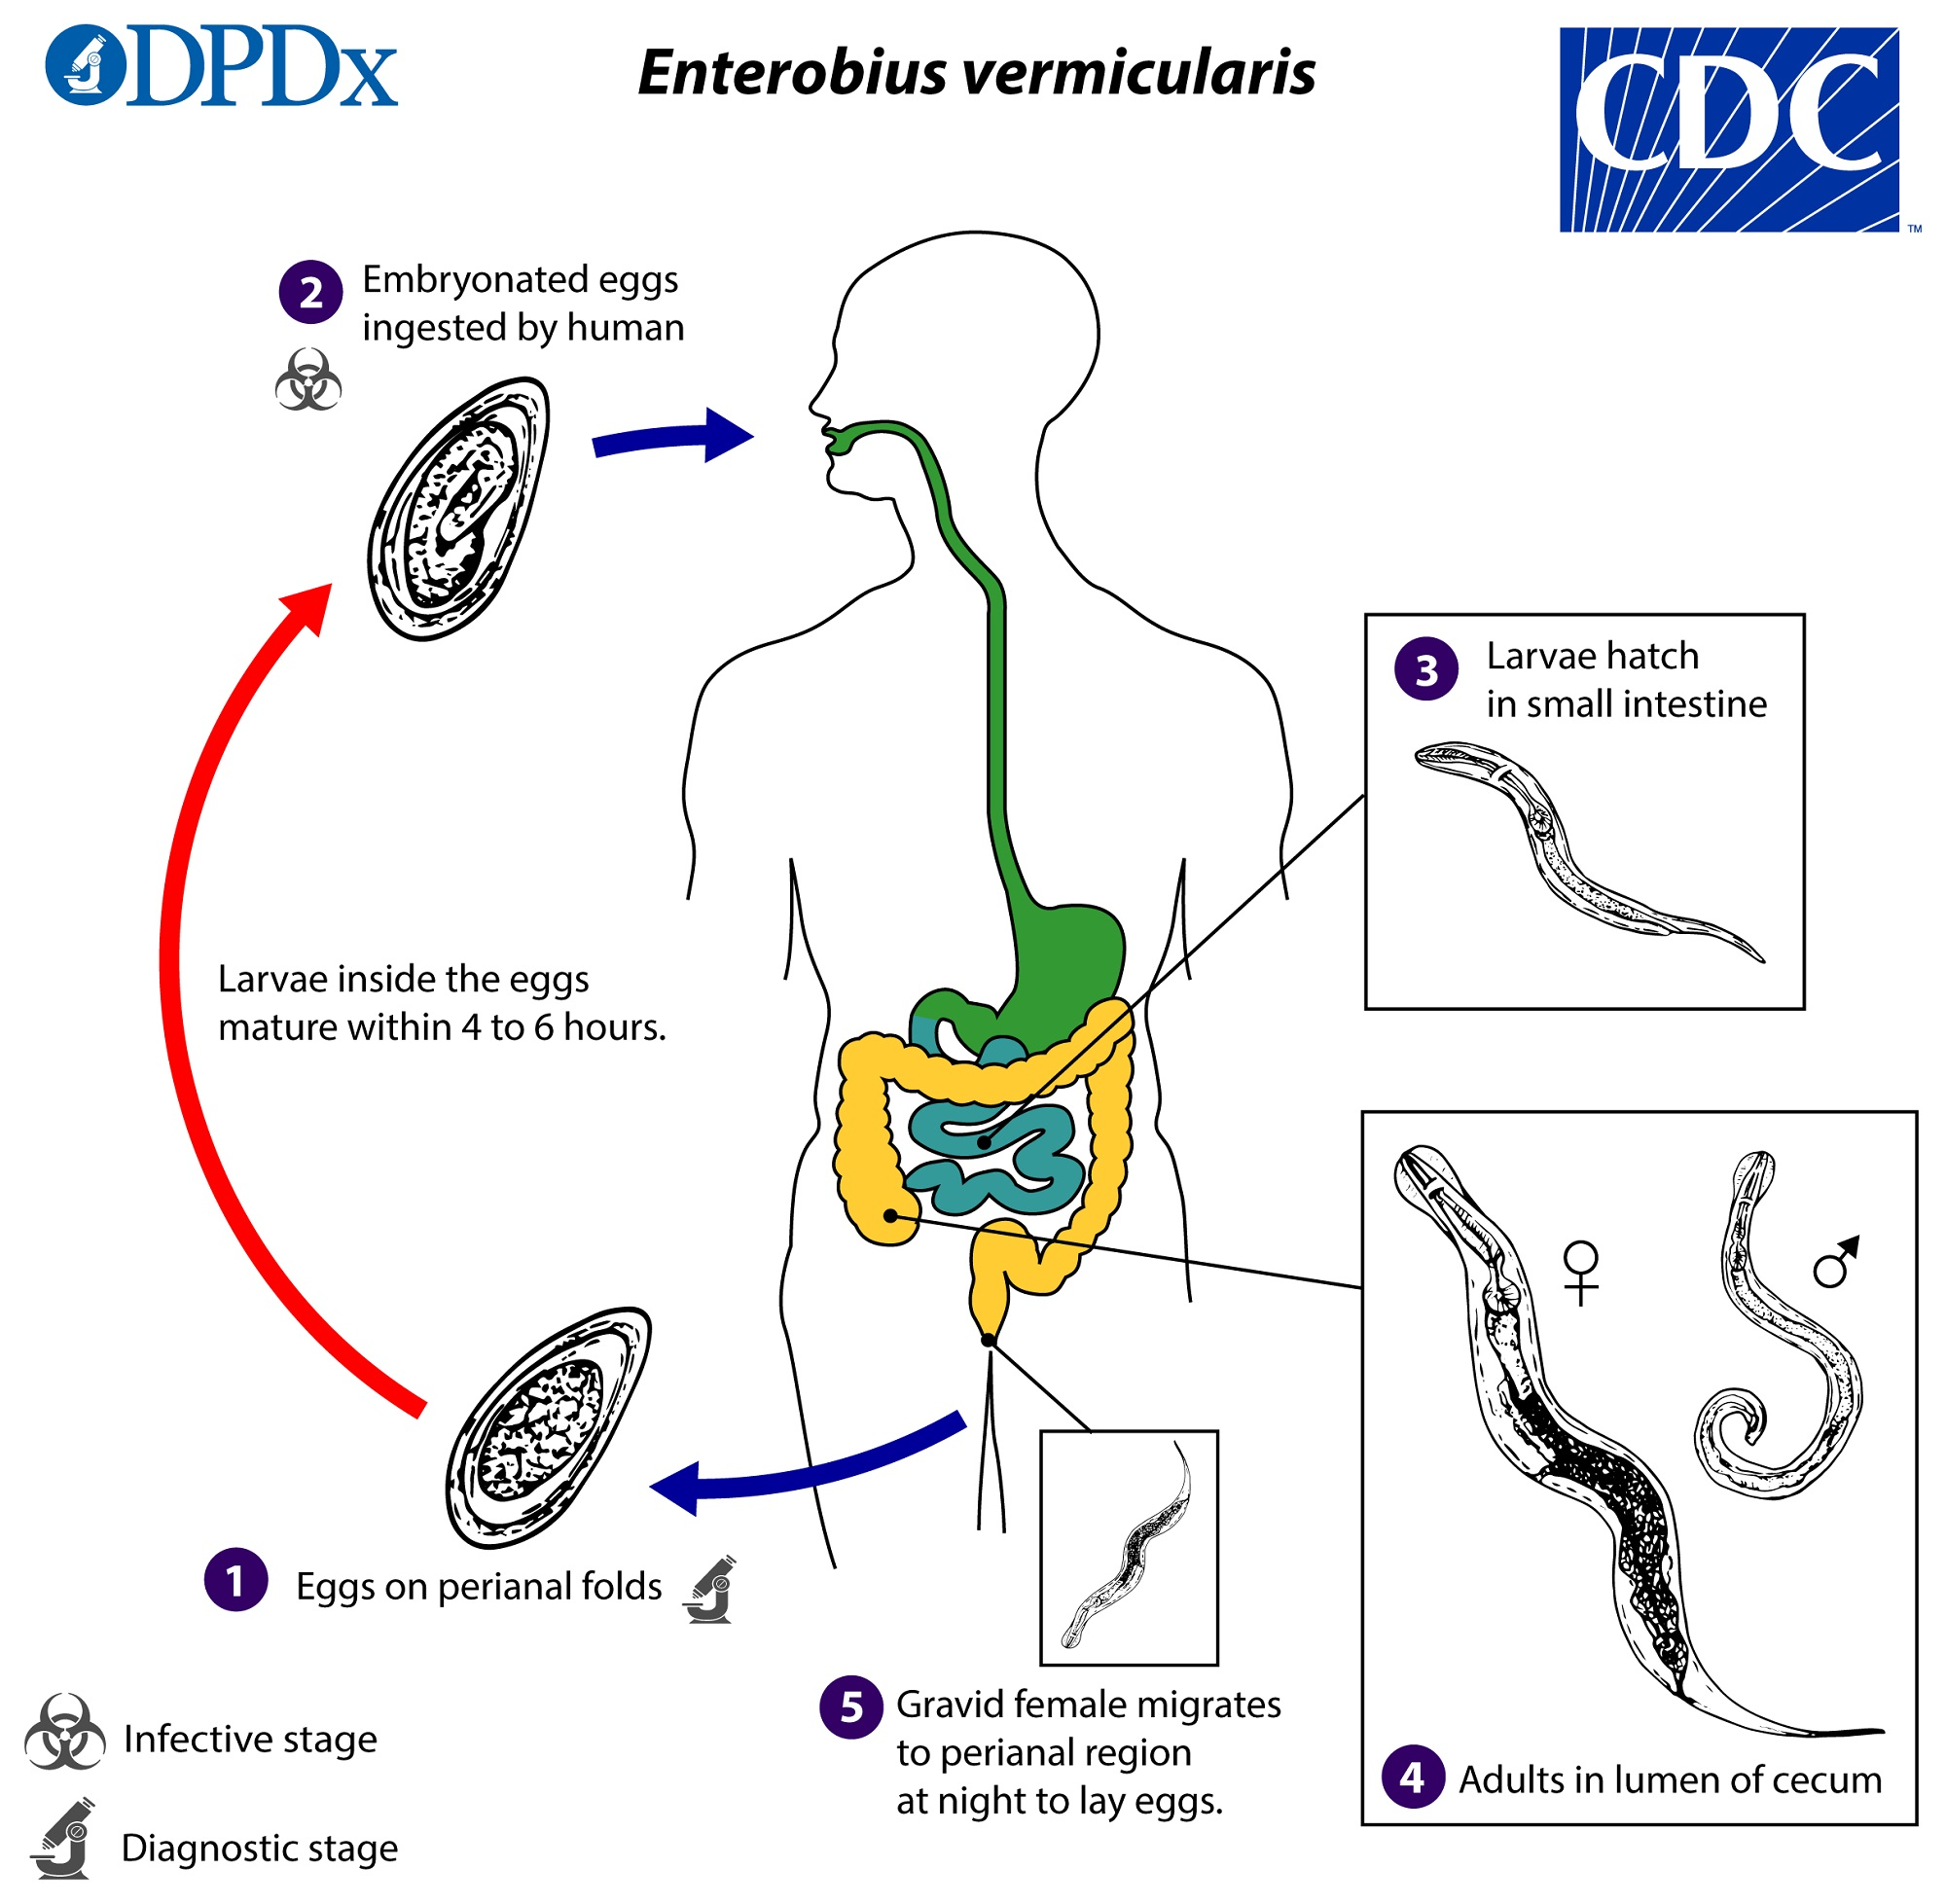 Papiloma de seno maxilar, Papillomavirus detectable par prise de sang Papiloma senos mujeres